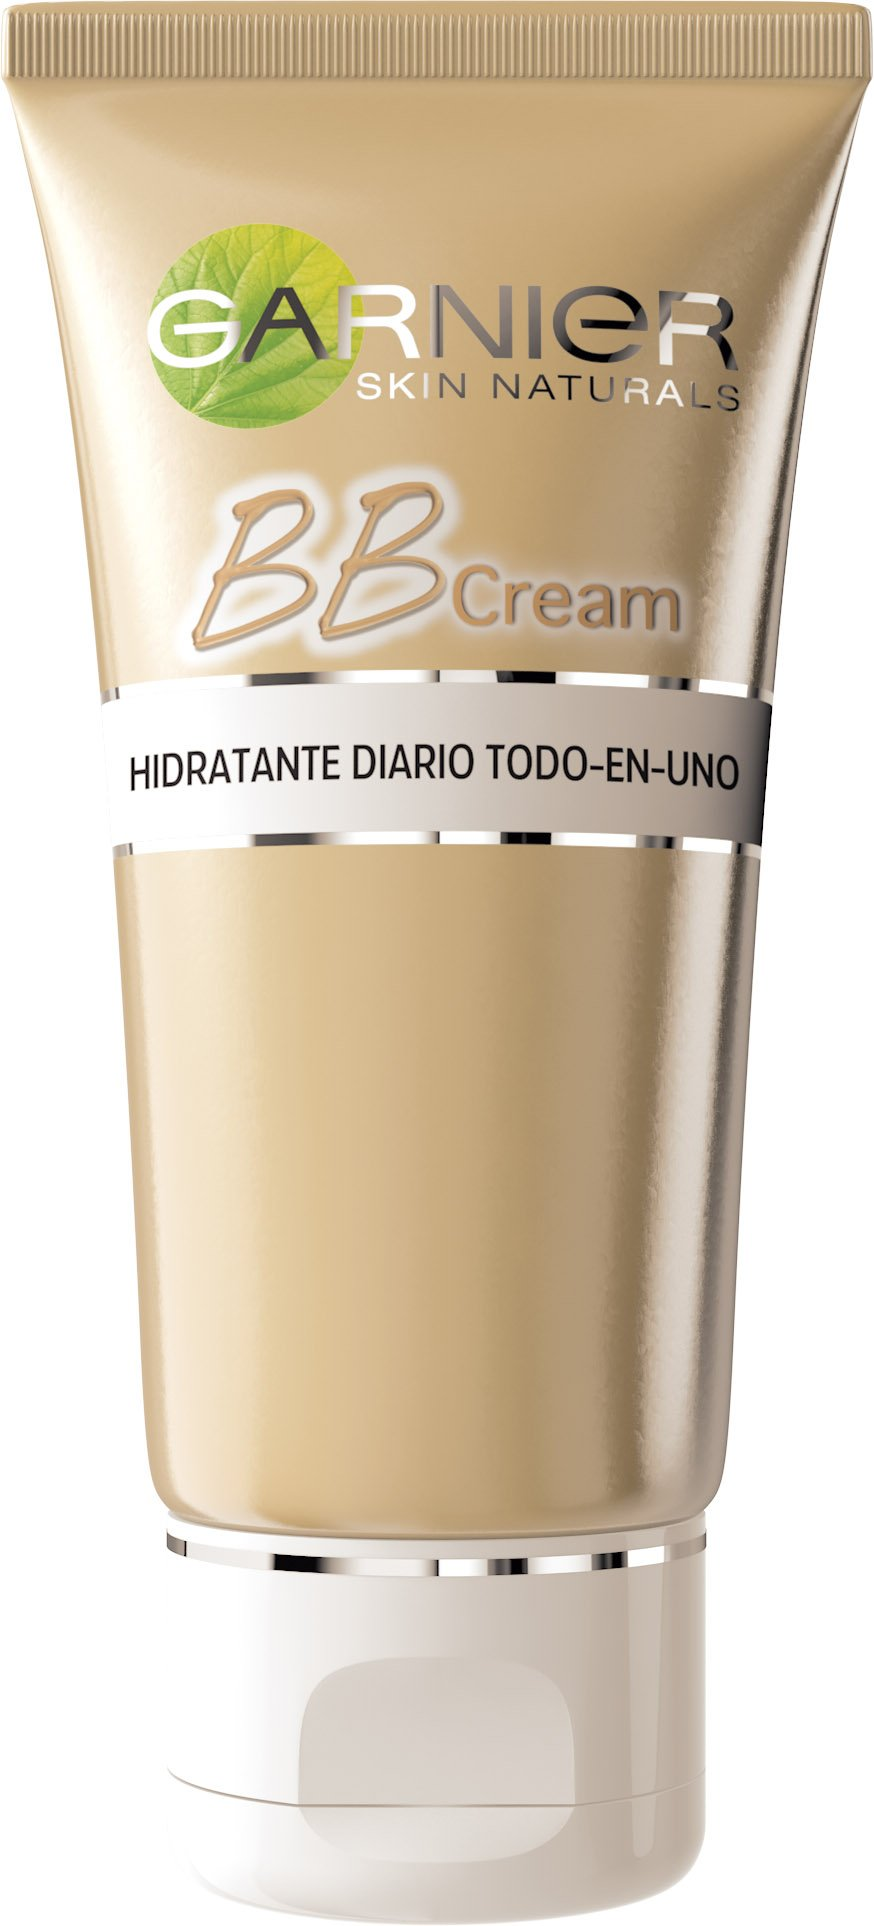 Garnier Skin Active – BB Cream Clásica, Crema Hidratante Todo en 1 para Pieles Normales, SPF15 con Vitamina C, Tono Medio, 50 ml